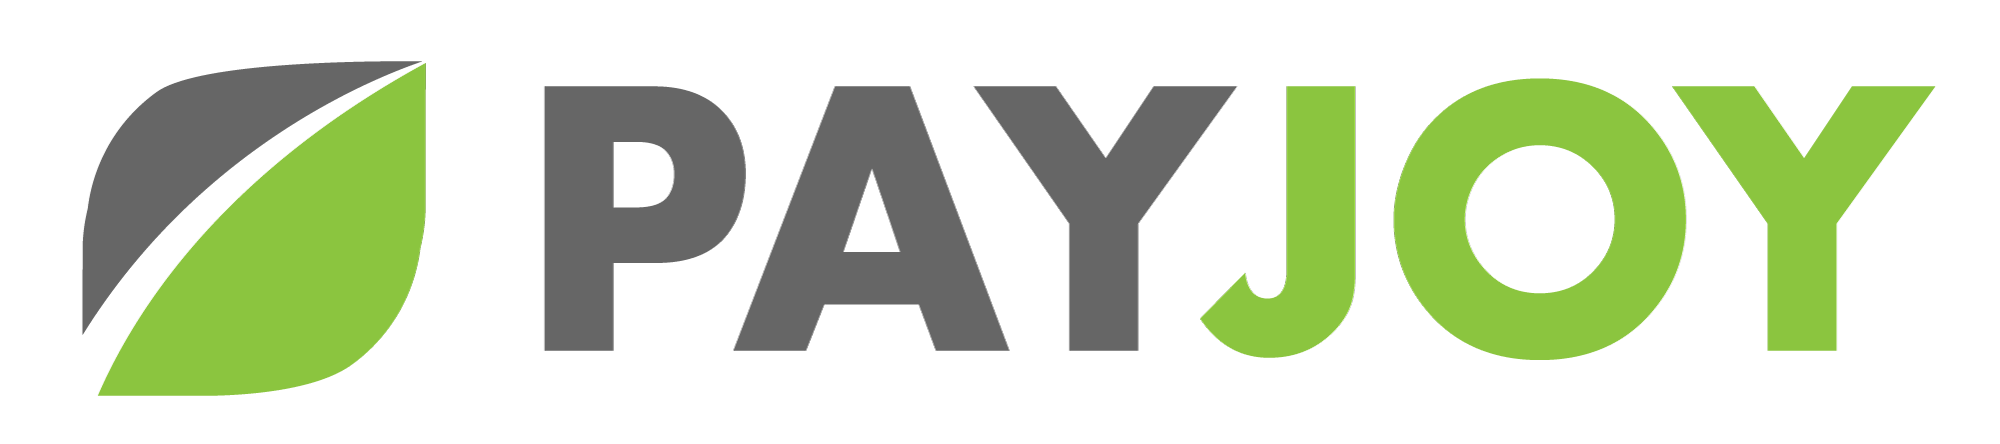 PayJoy logo